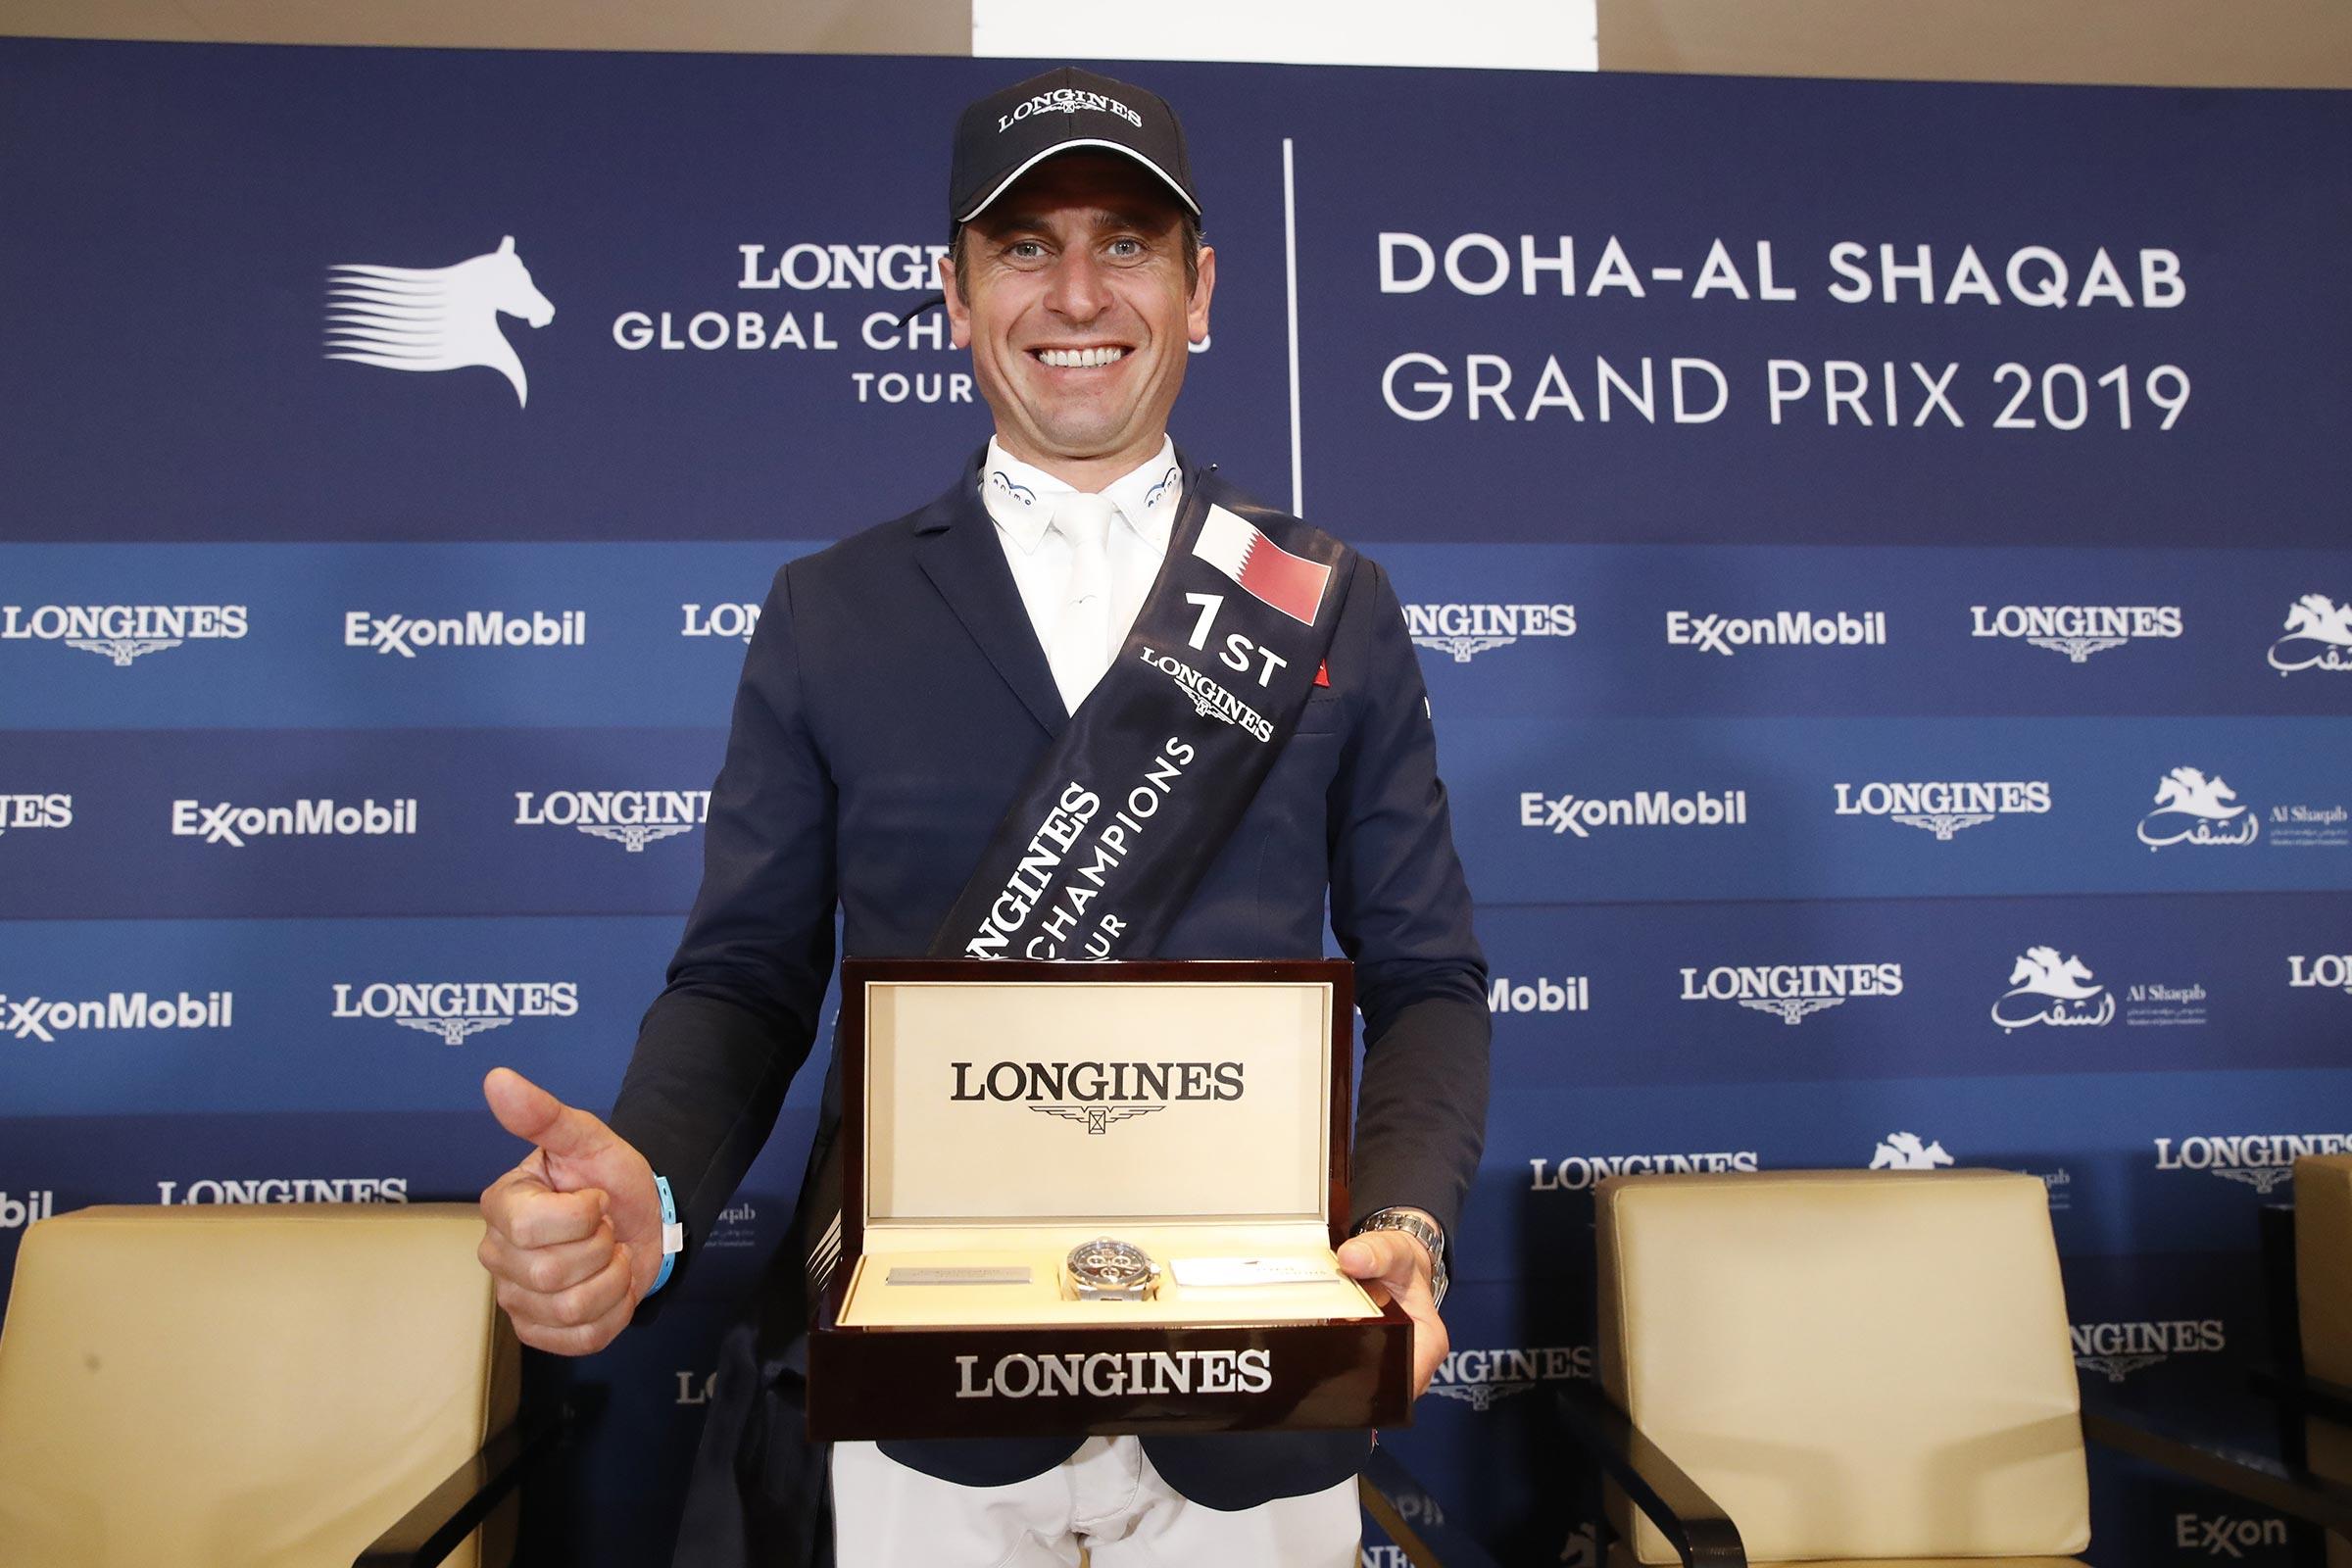 Julien Epaillard with the Longines watch ph.Stefano Grasso/LGCT DOHA 2019